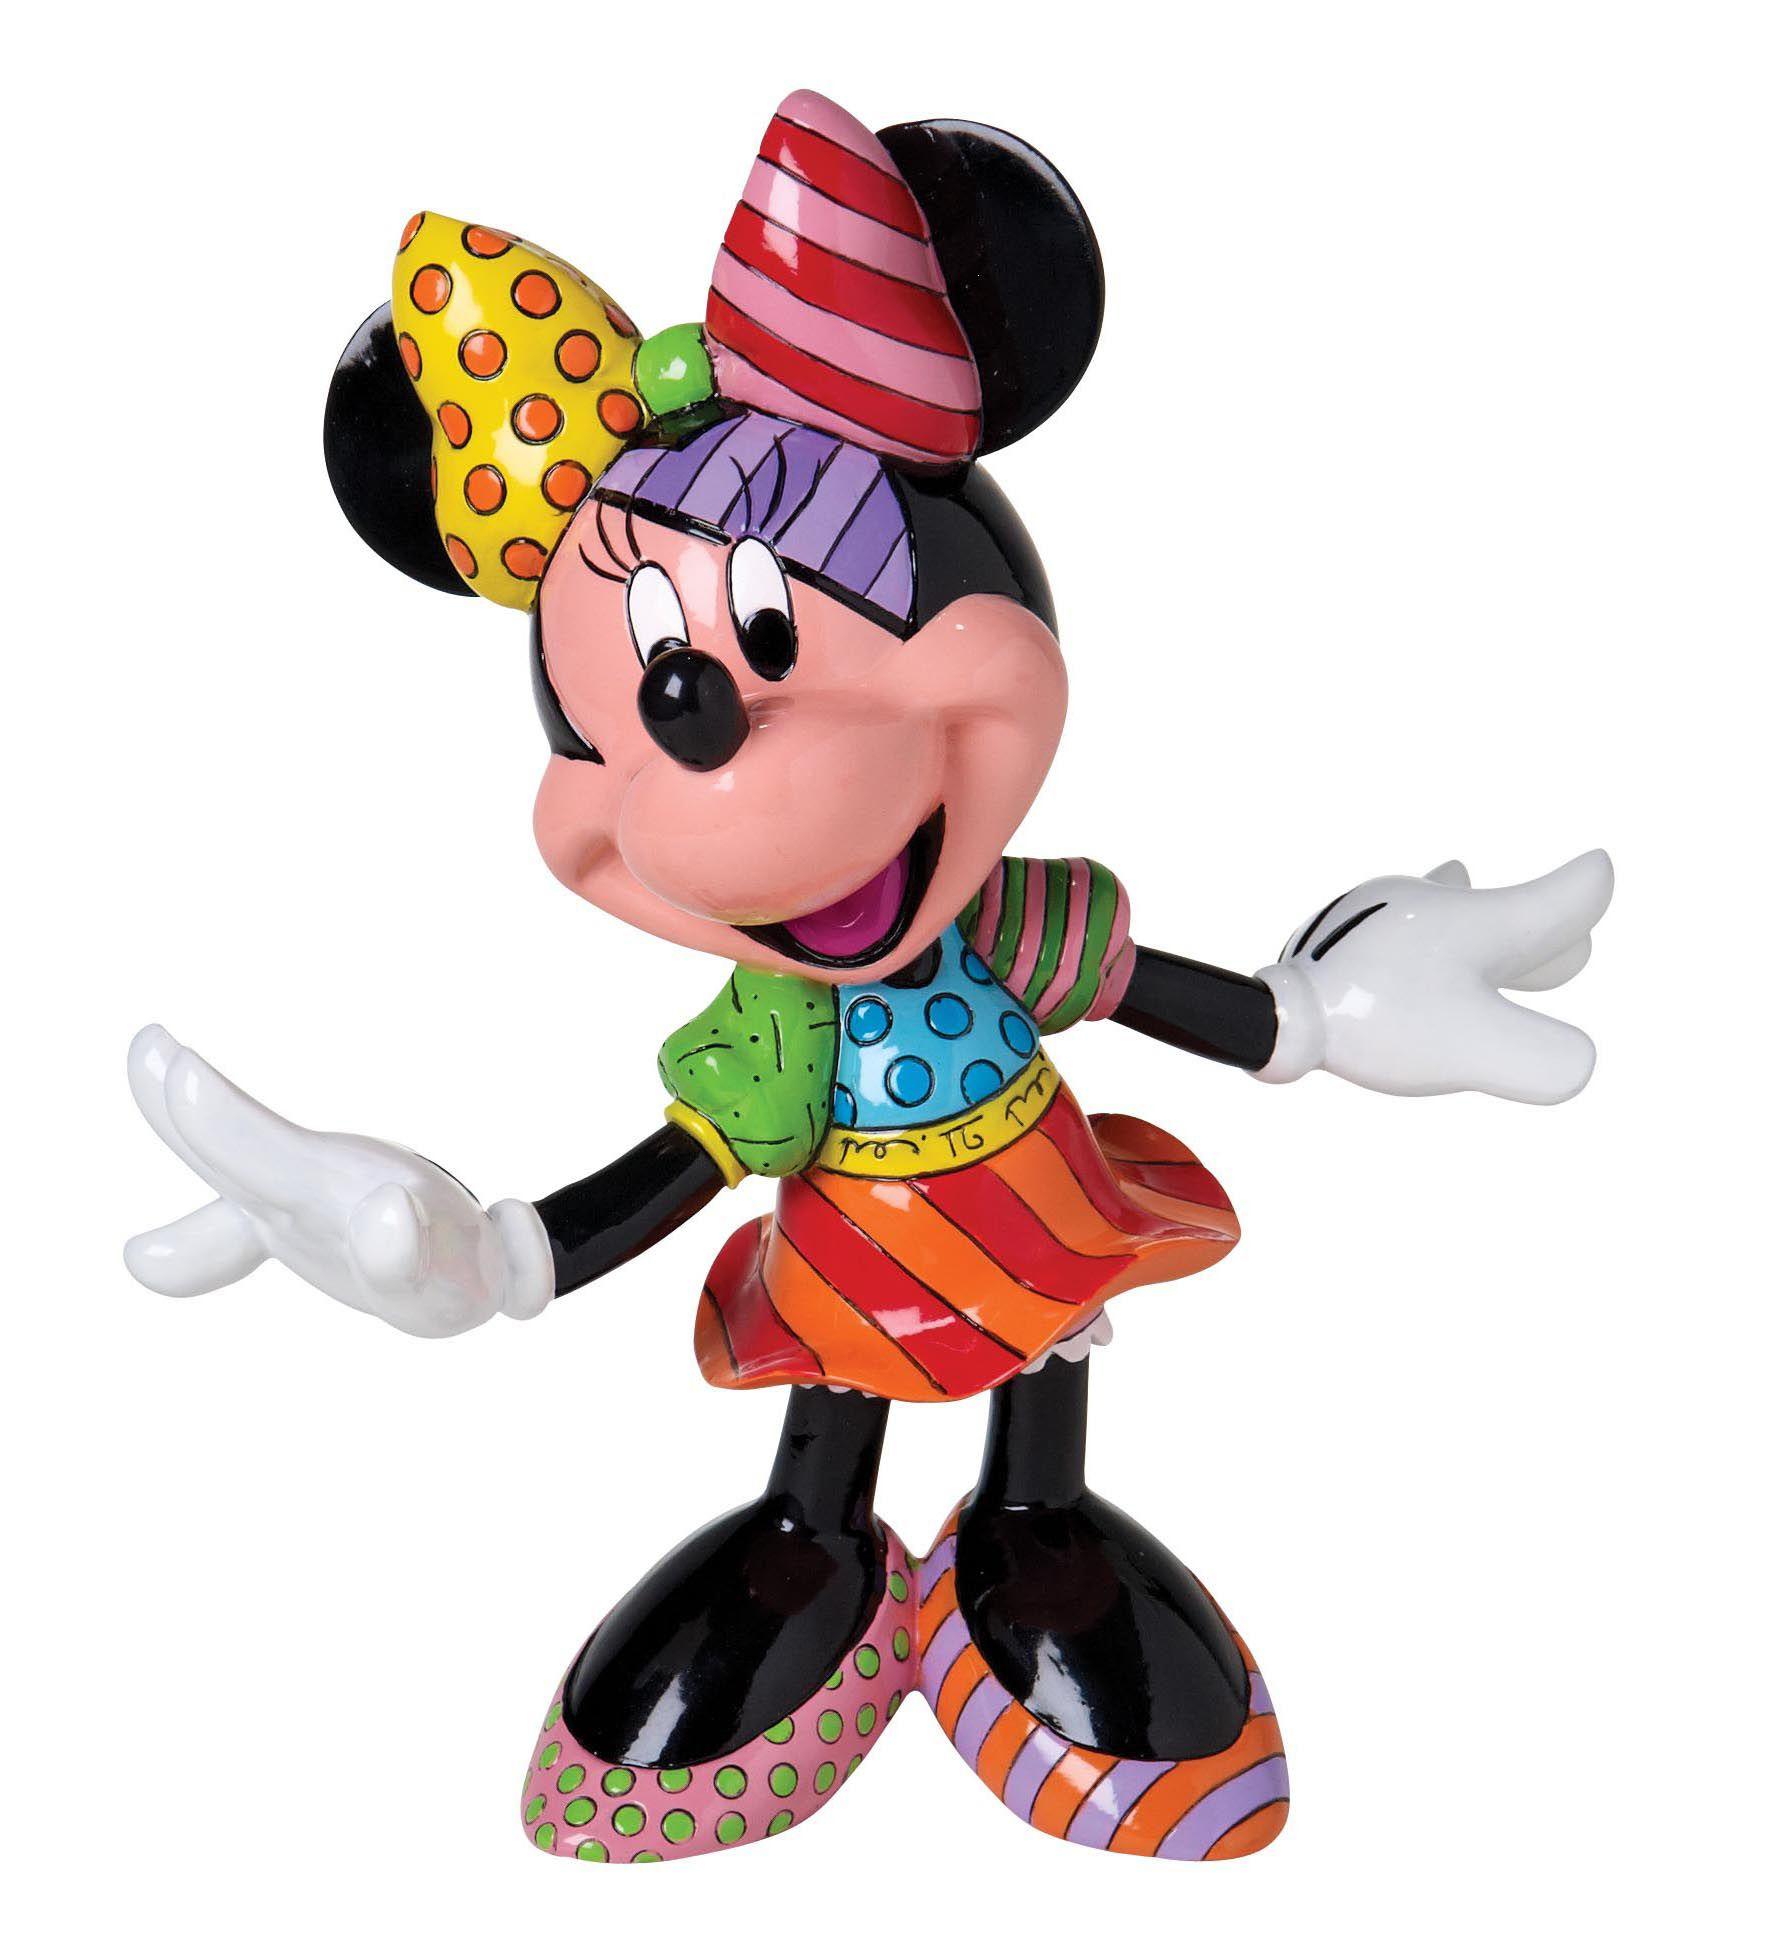 DISNEY BY BRITTO Disney by Britto Figur PopArt, »Minnie Mouse«